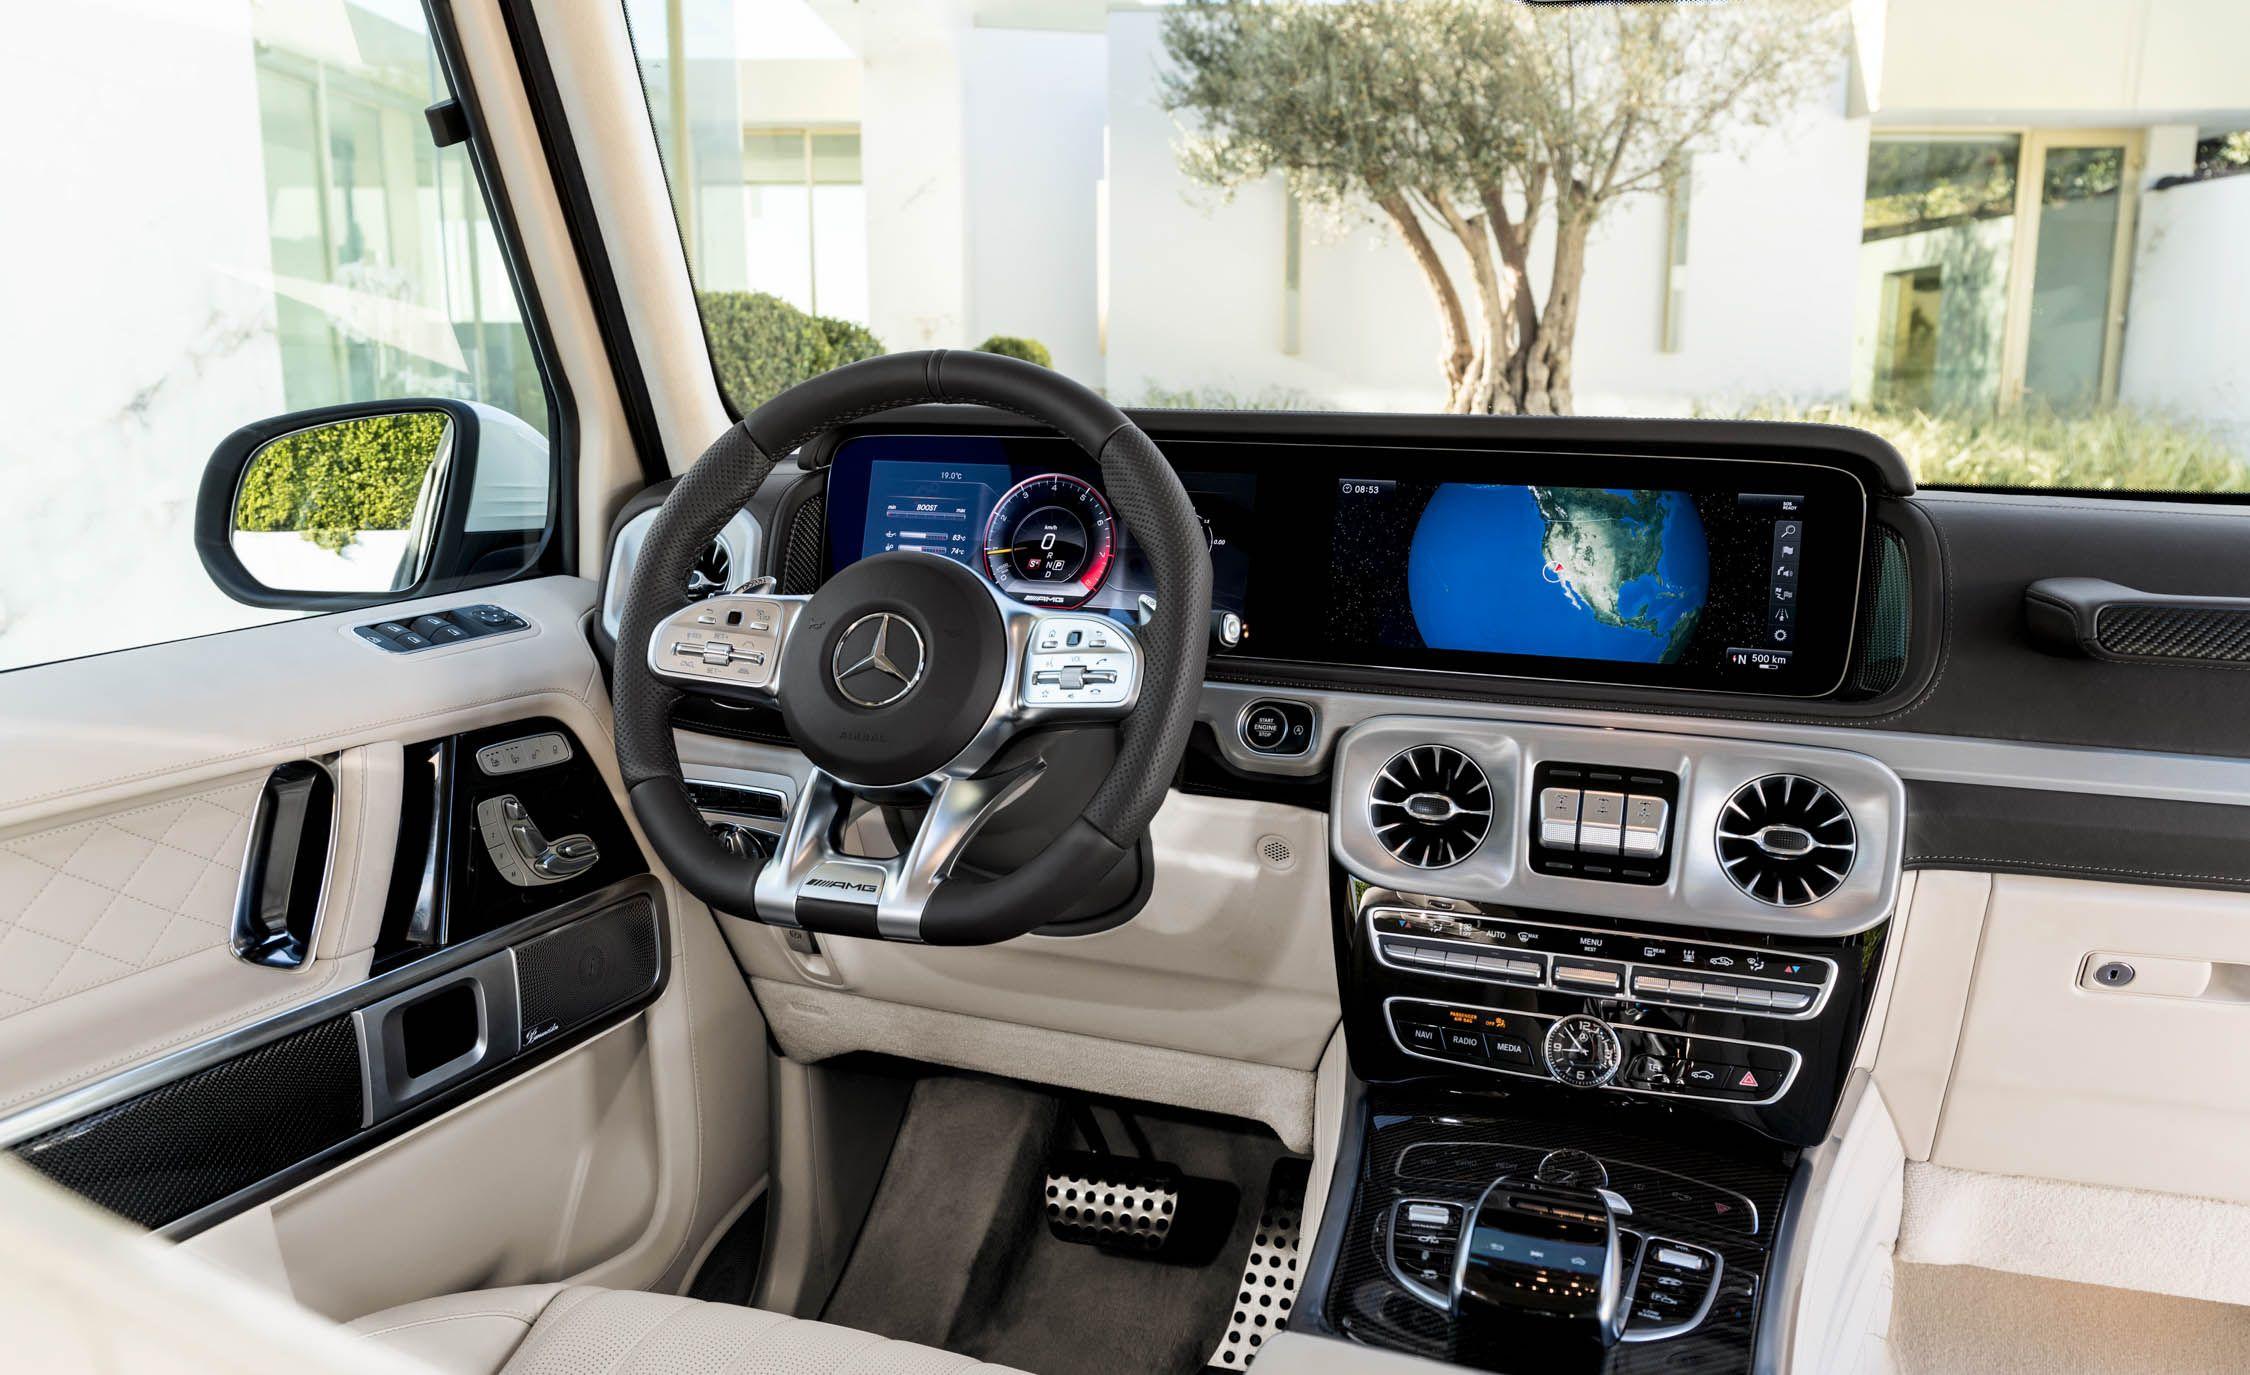 2019 Mercedes Amg G63 G65 4matic Reviews Mercedes Amg G63 G65